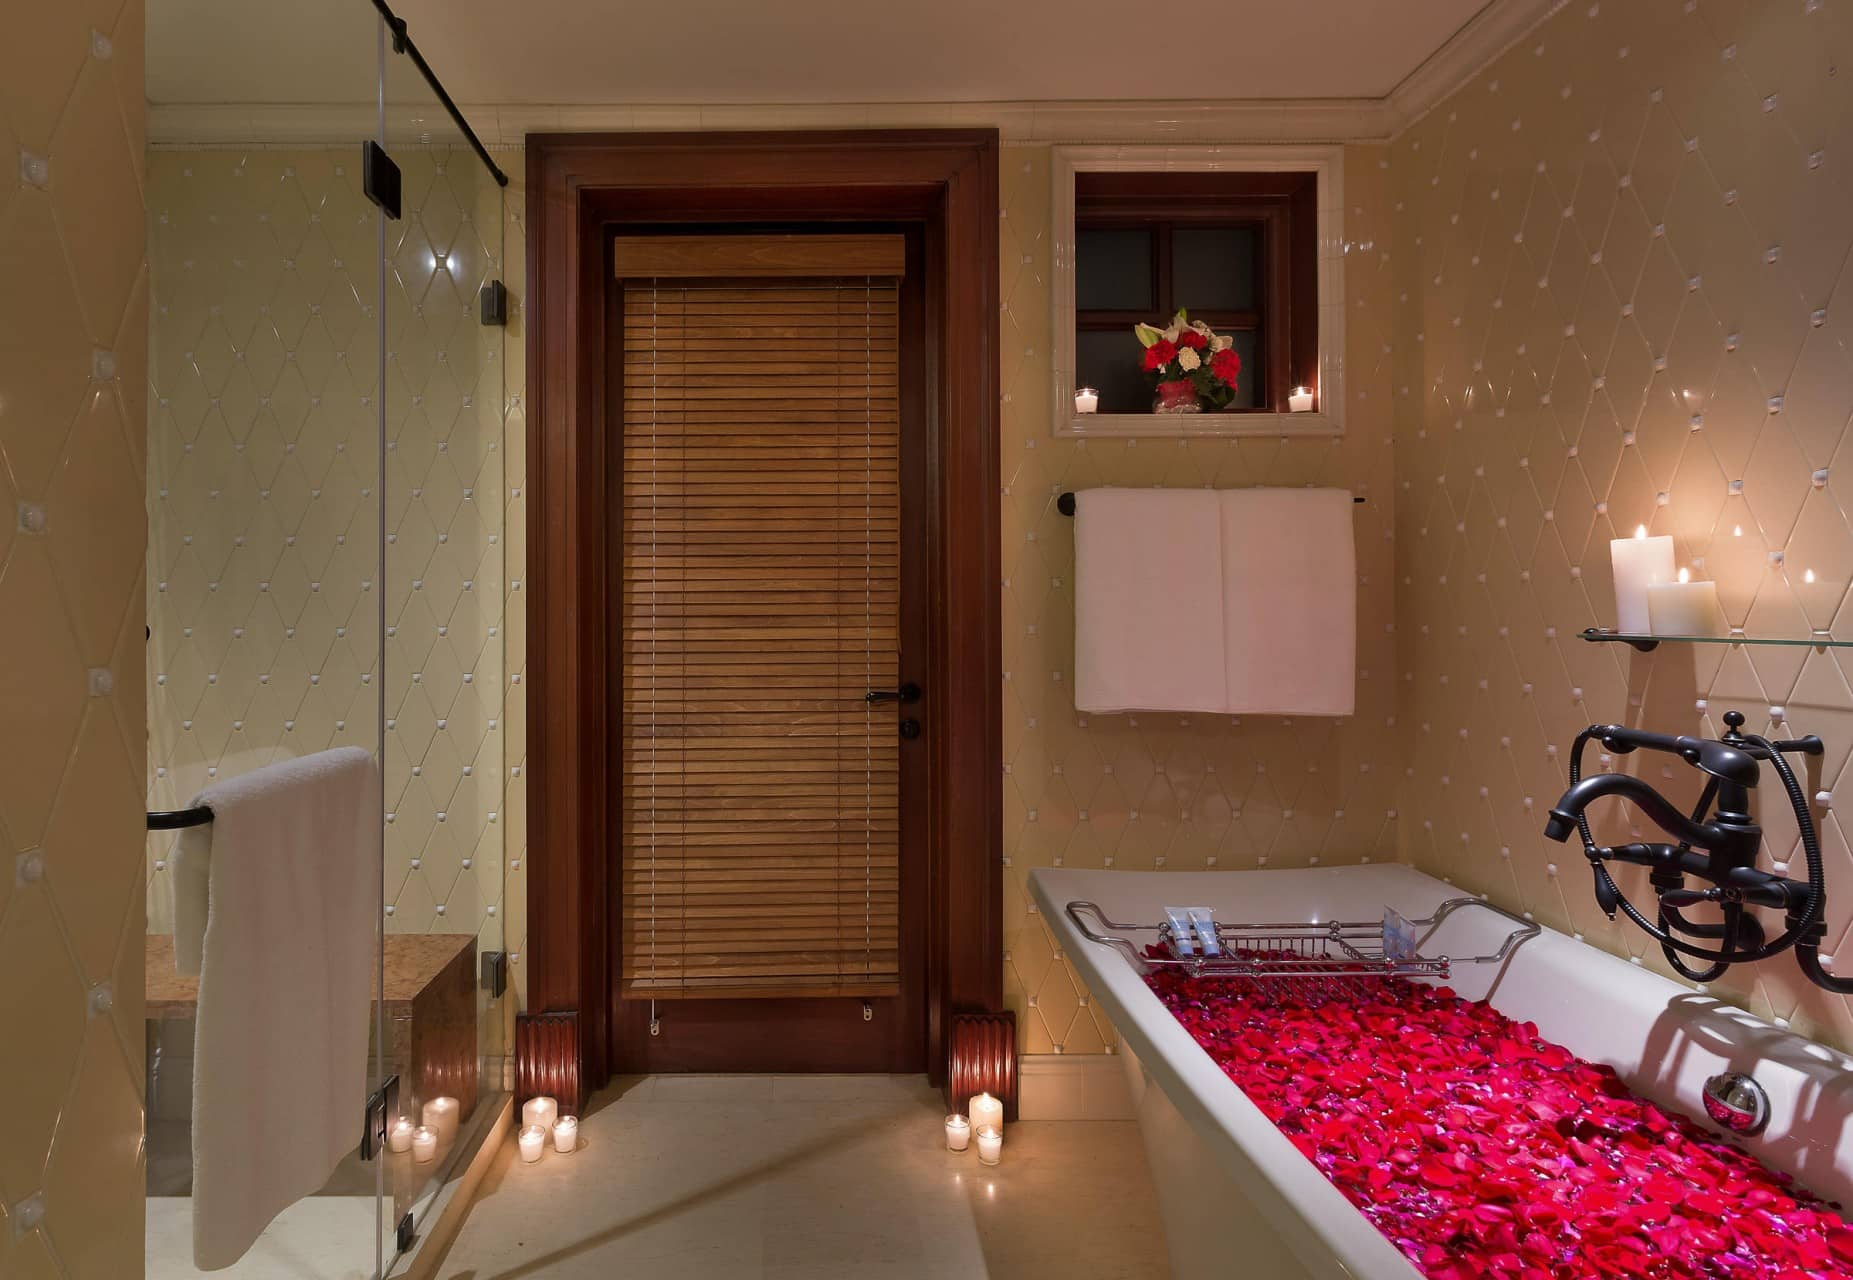 Best Architecture Photographer Delhi India   Collection of Luxury Bathroom Photography Delhi